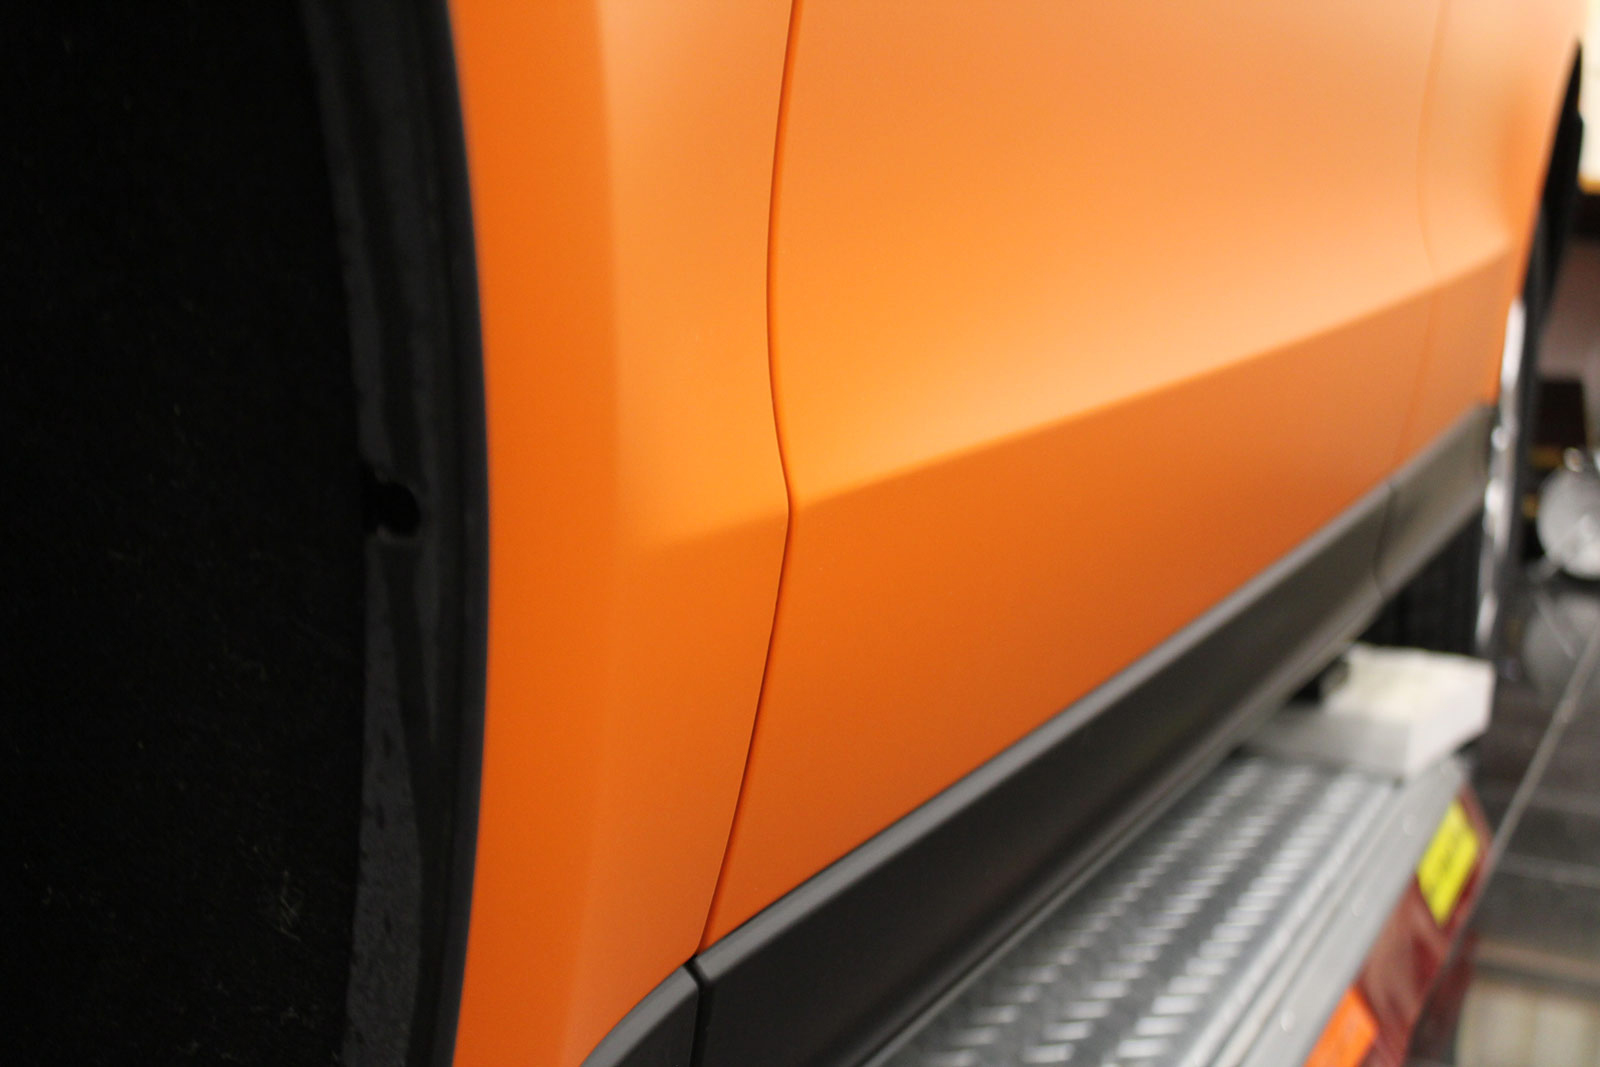 Audi_Q5_Folierung_Orange_Matt_14